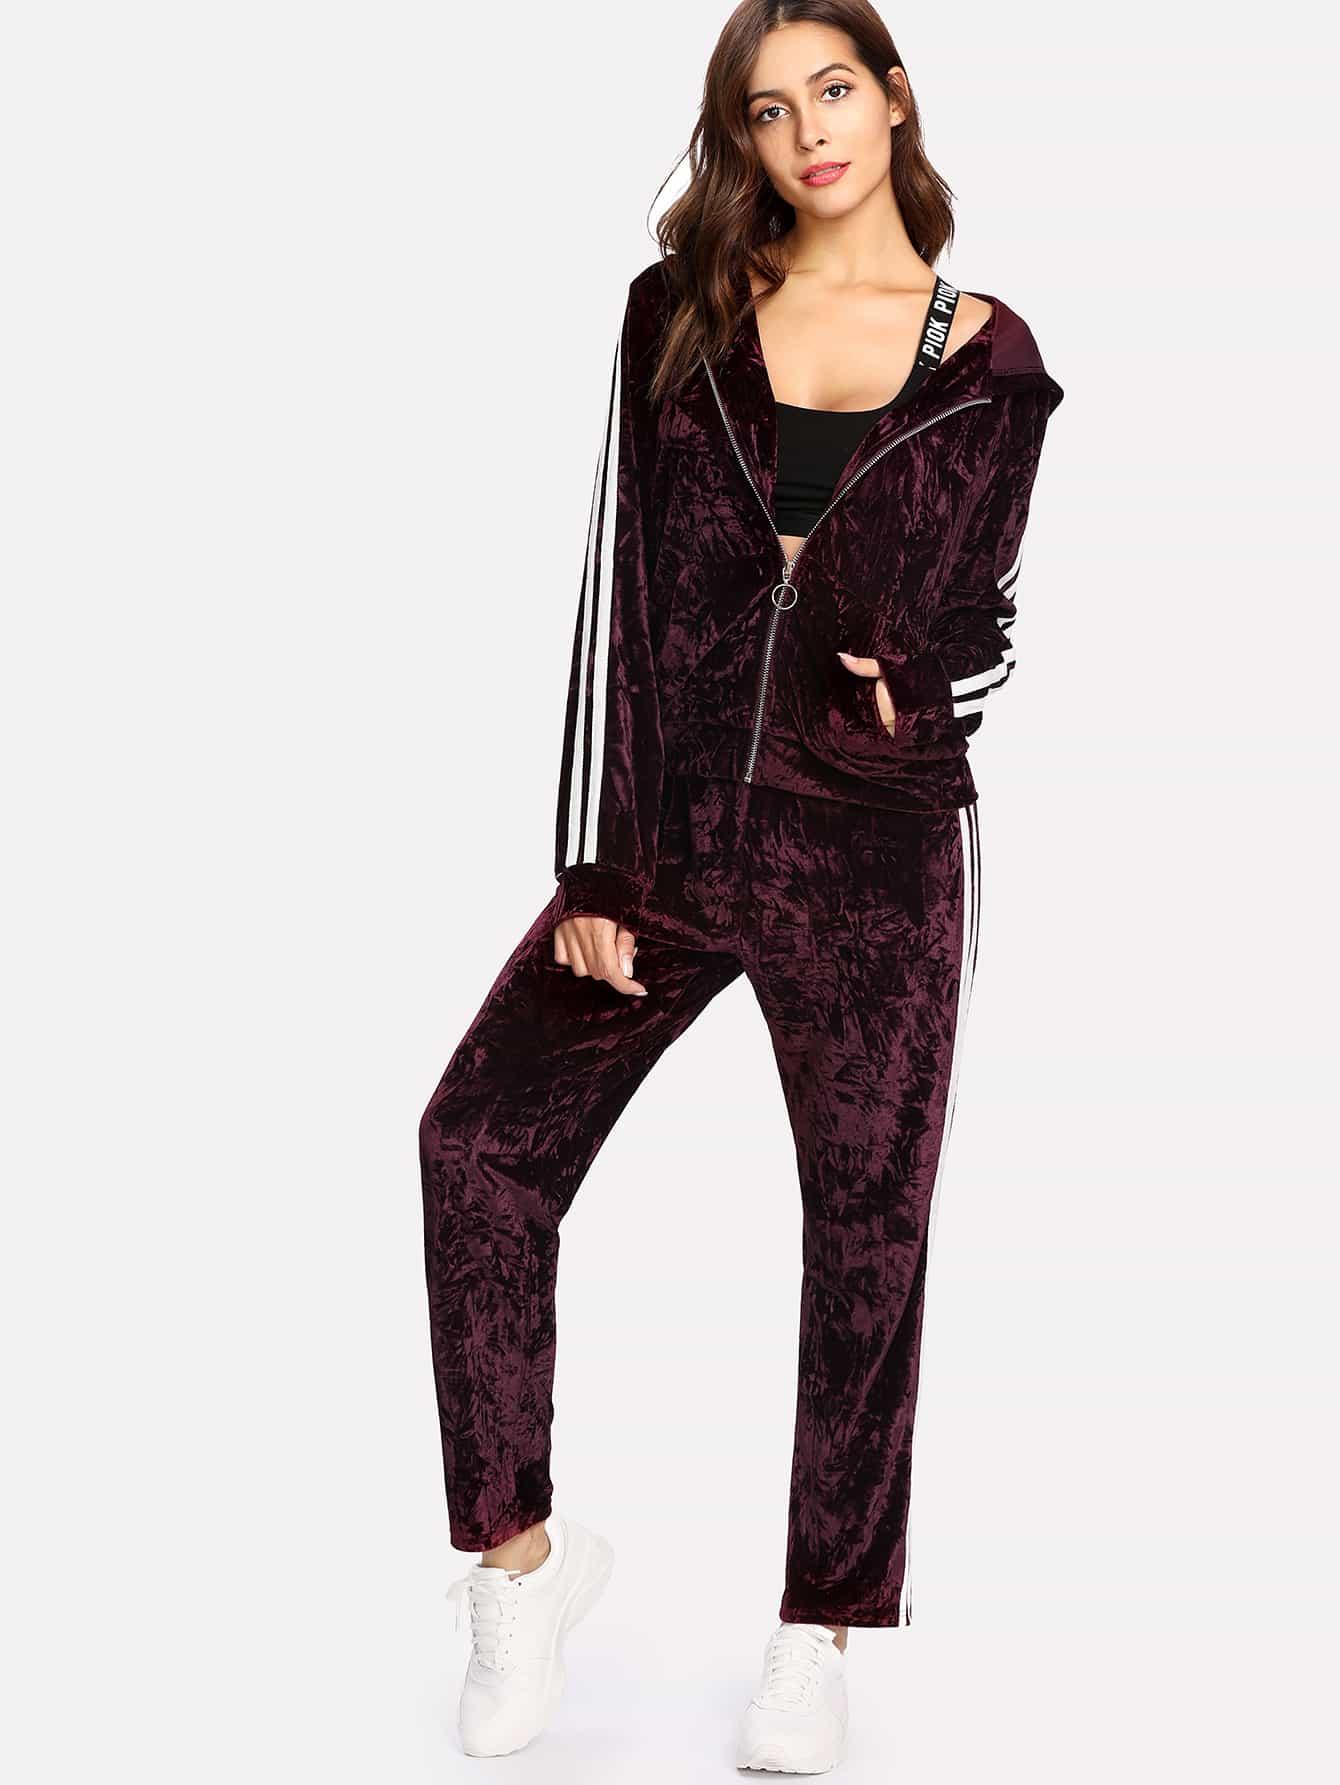 Striped Crushed Velvet Hoodie Jacket & Pants Set striped tape applique velvet pants